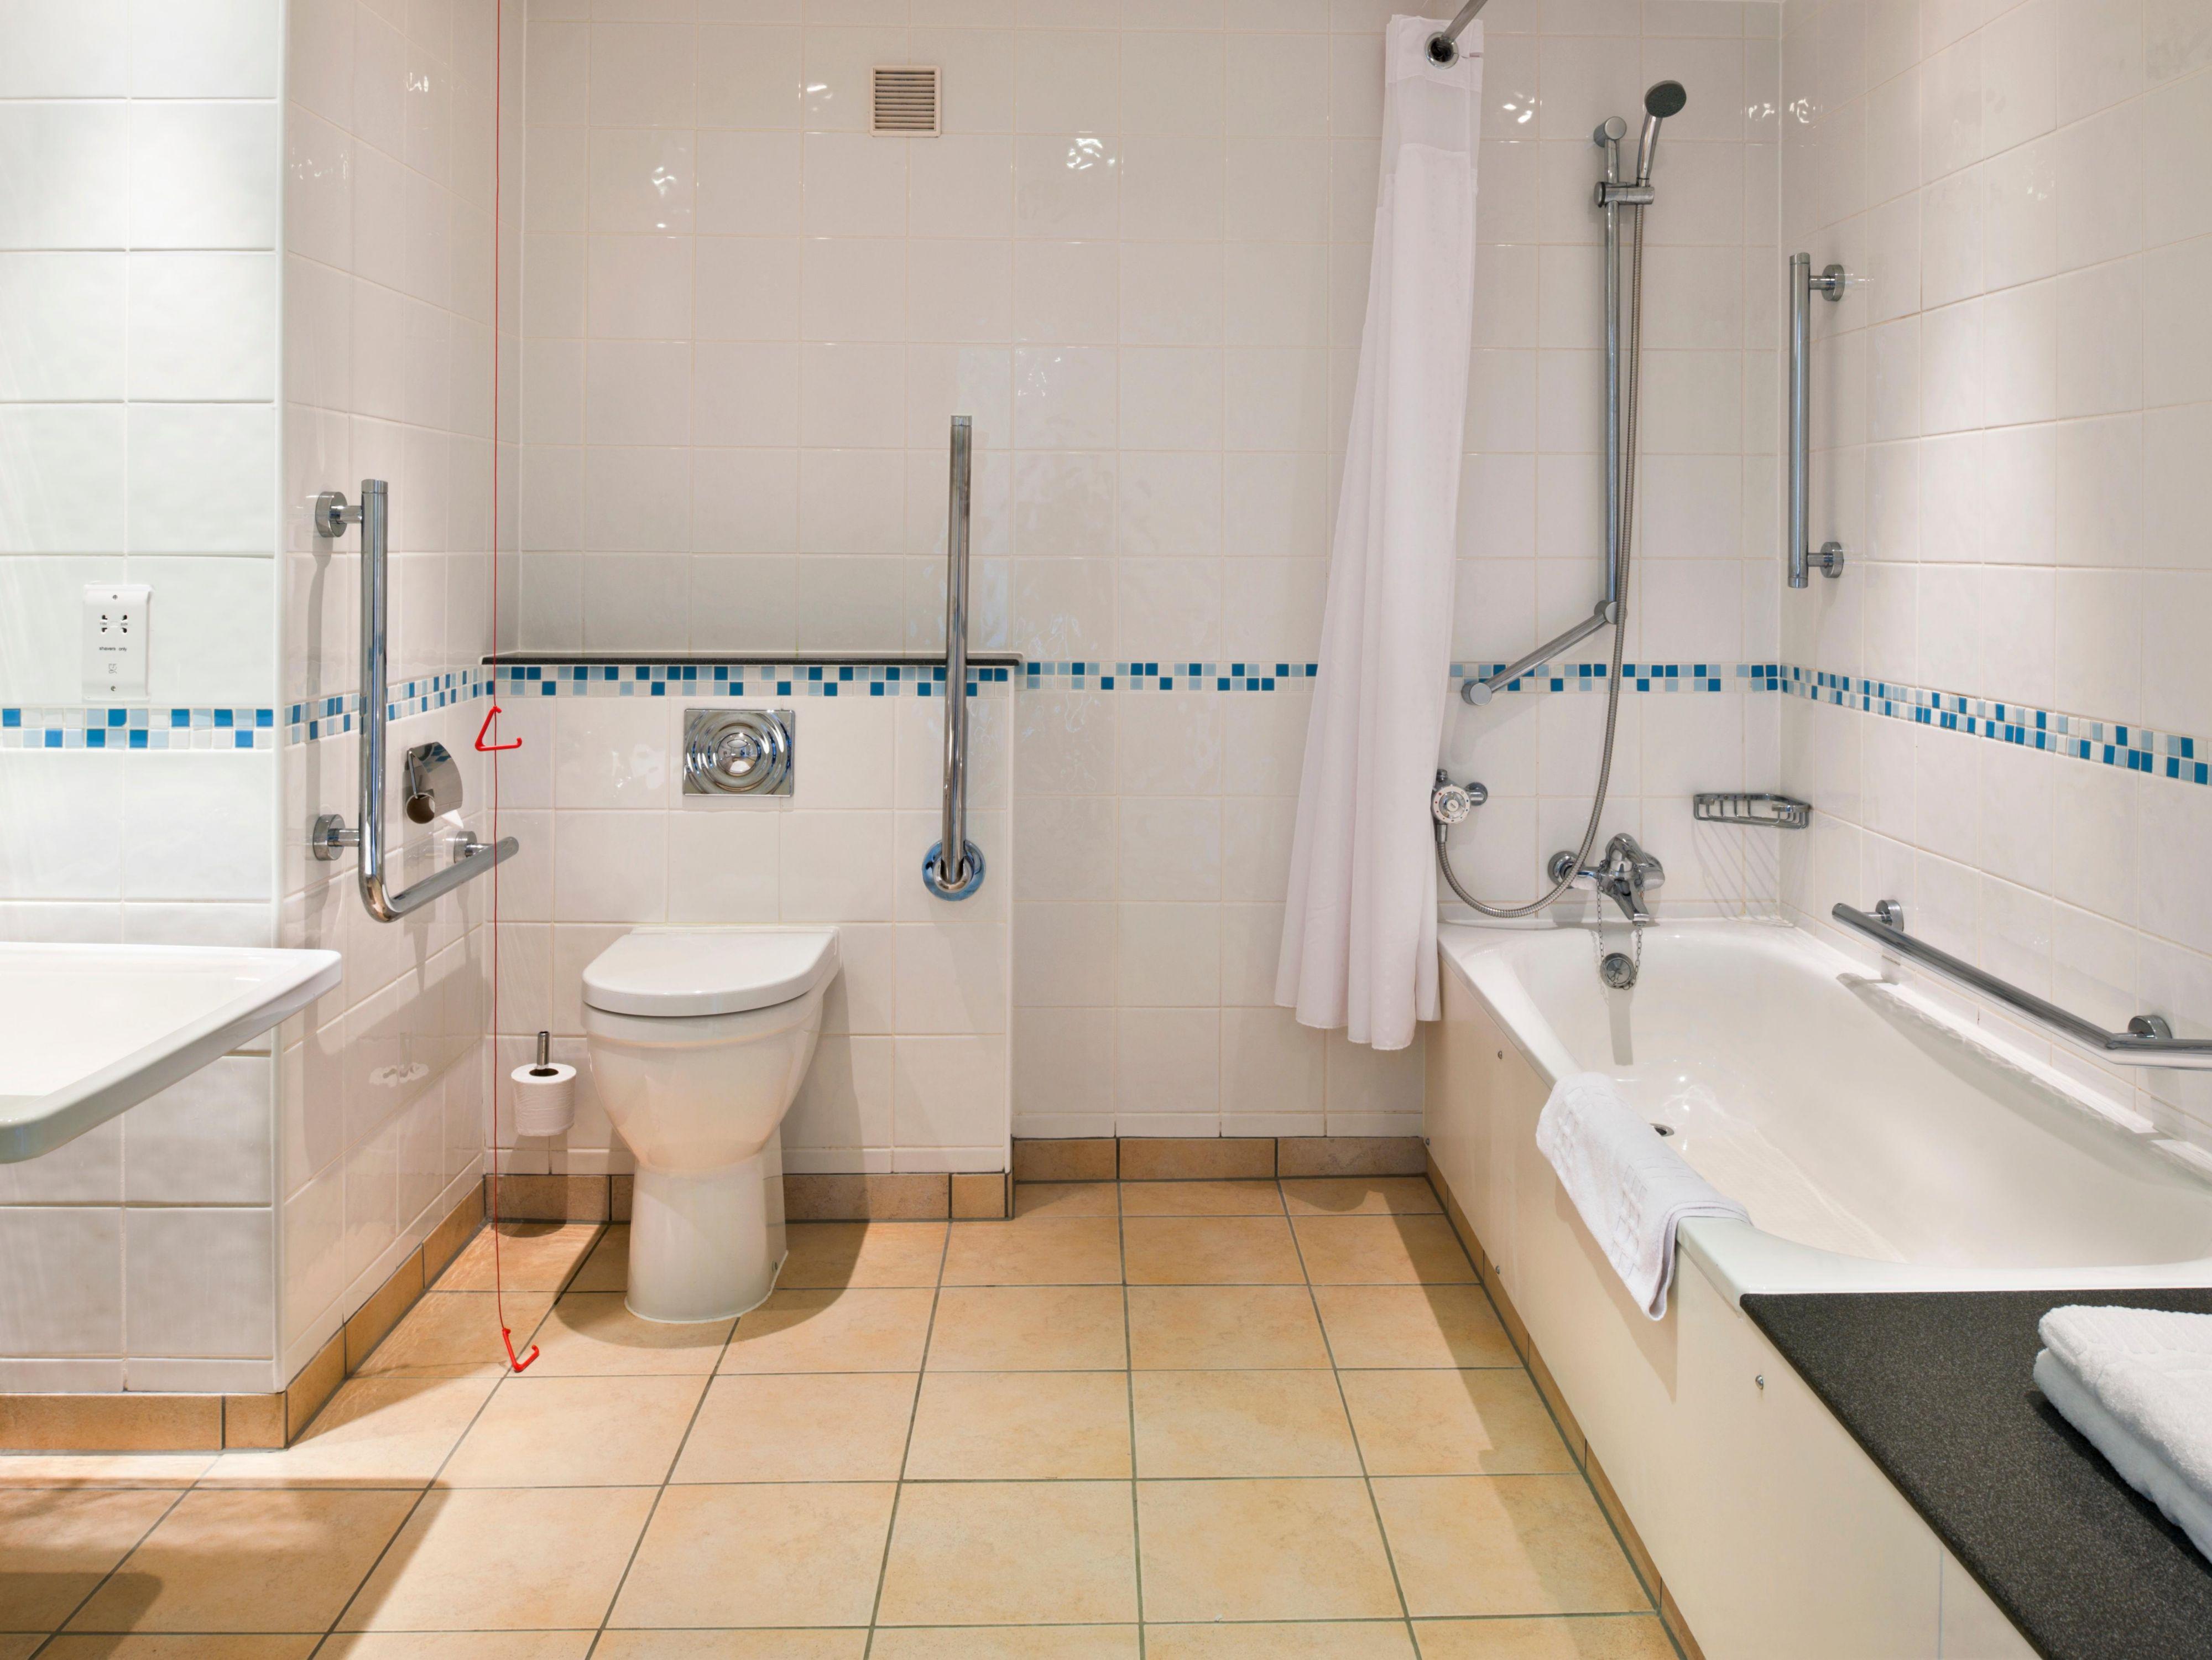 Holiday Inn Runcorn Отели Runcorn Отель Номер  #376A83